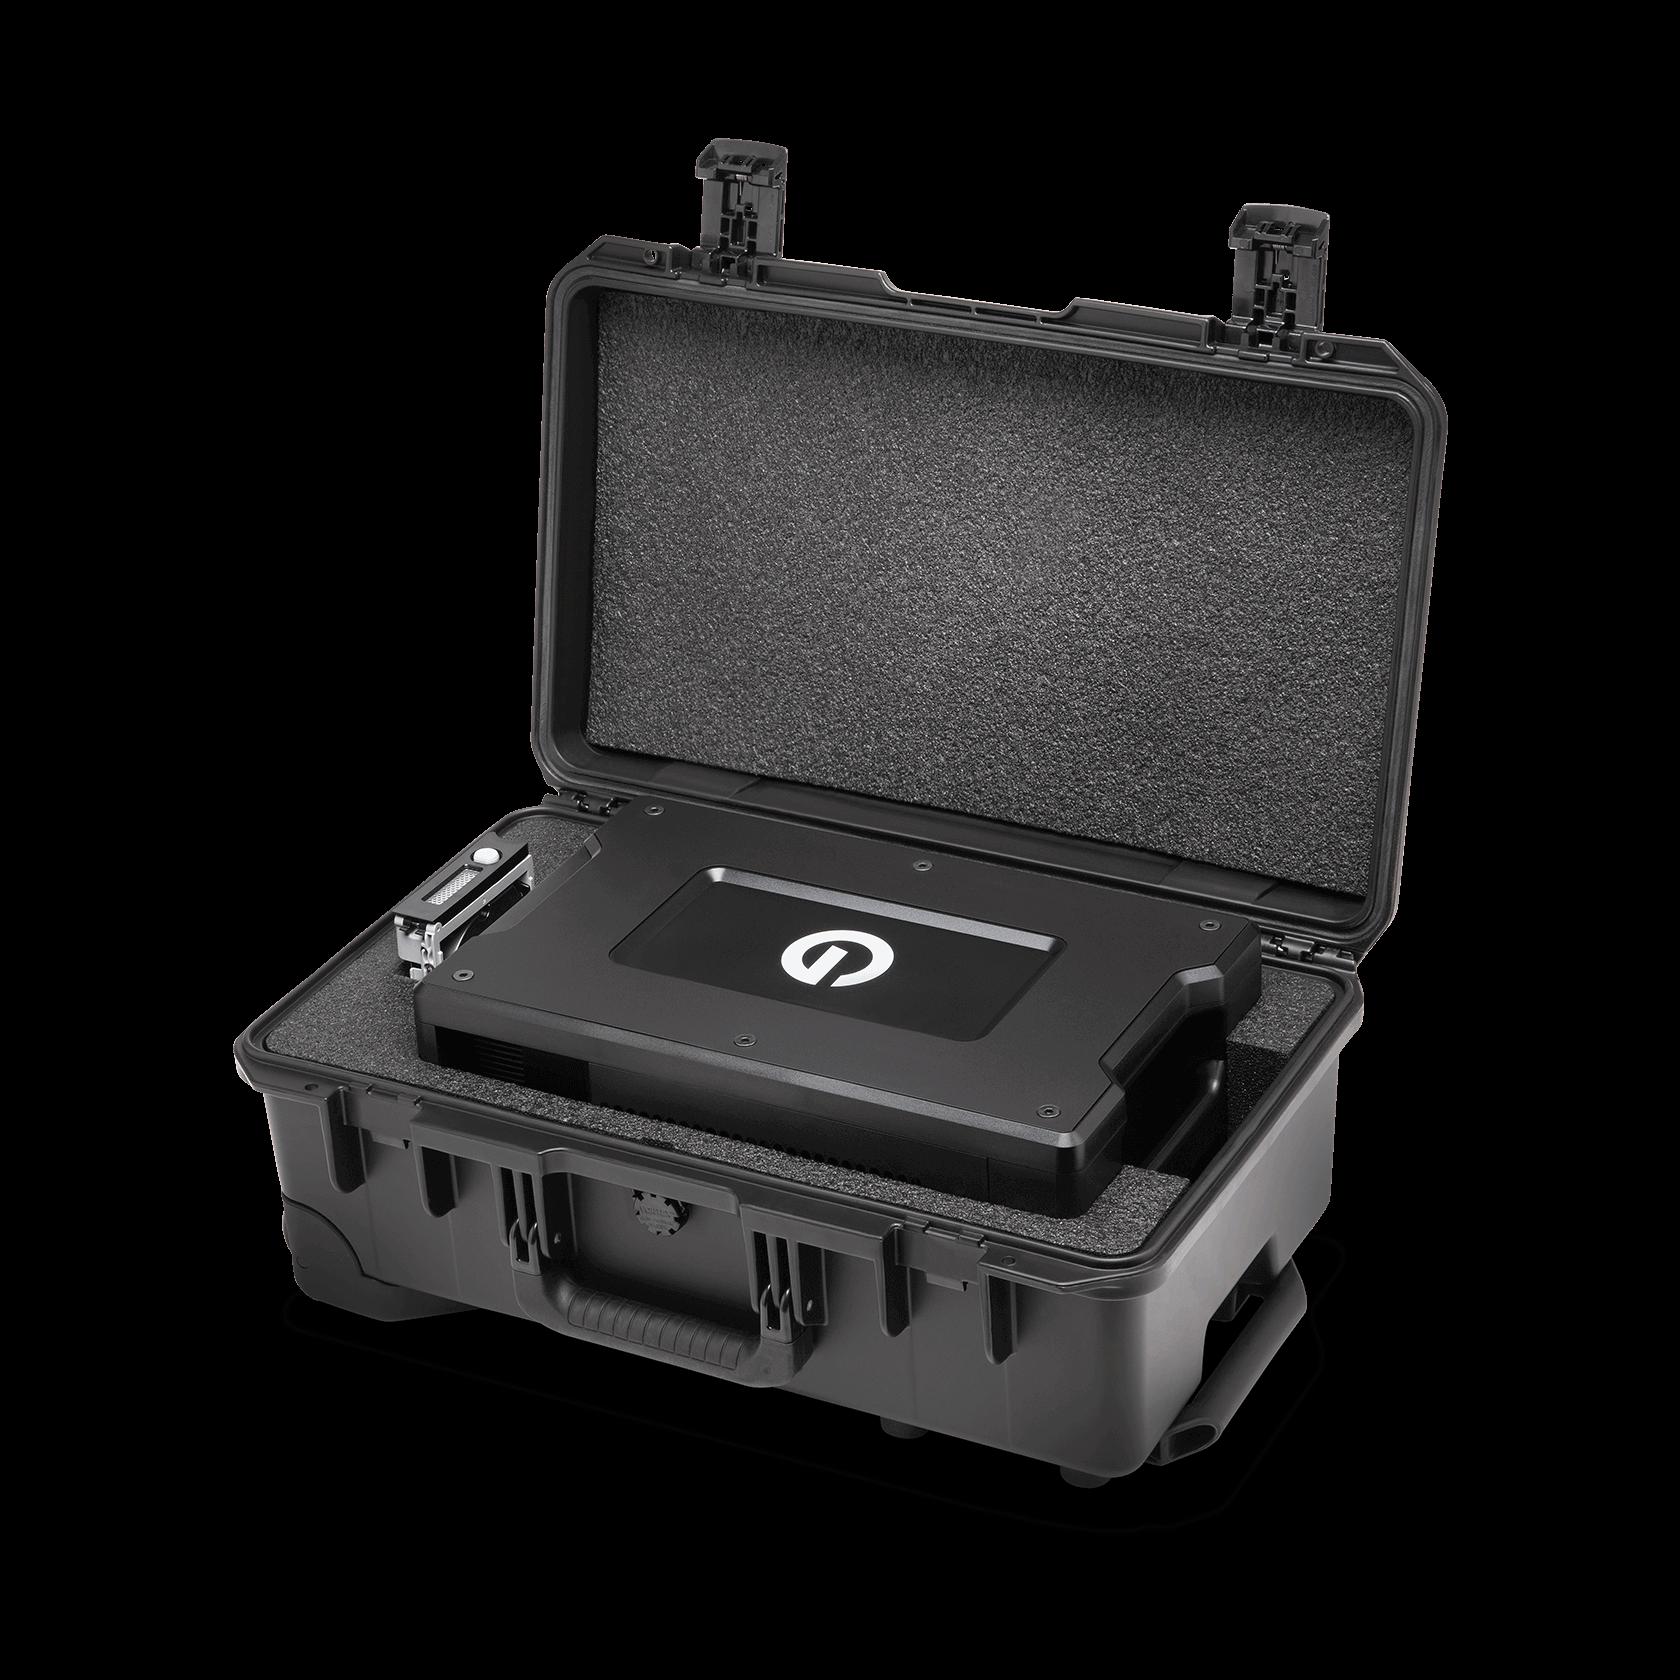 WesternDigital coupon: G-Technology Shuttle XL Case Peli IM2500 Spare module Foam, 8-bay Storage System - 0G04980-1